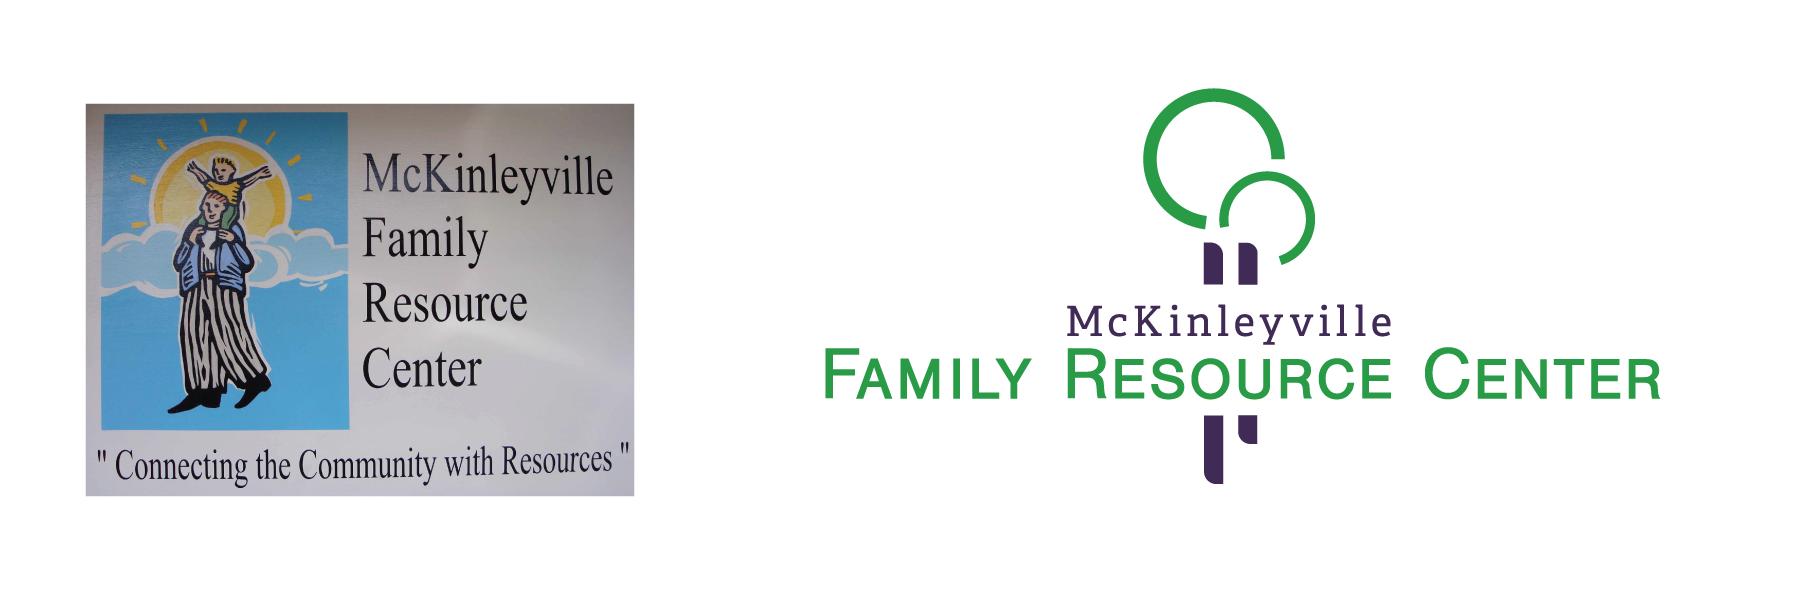 Logo comparison for McKinleyville Family Resource Center